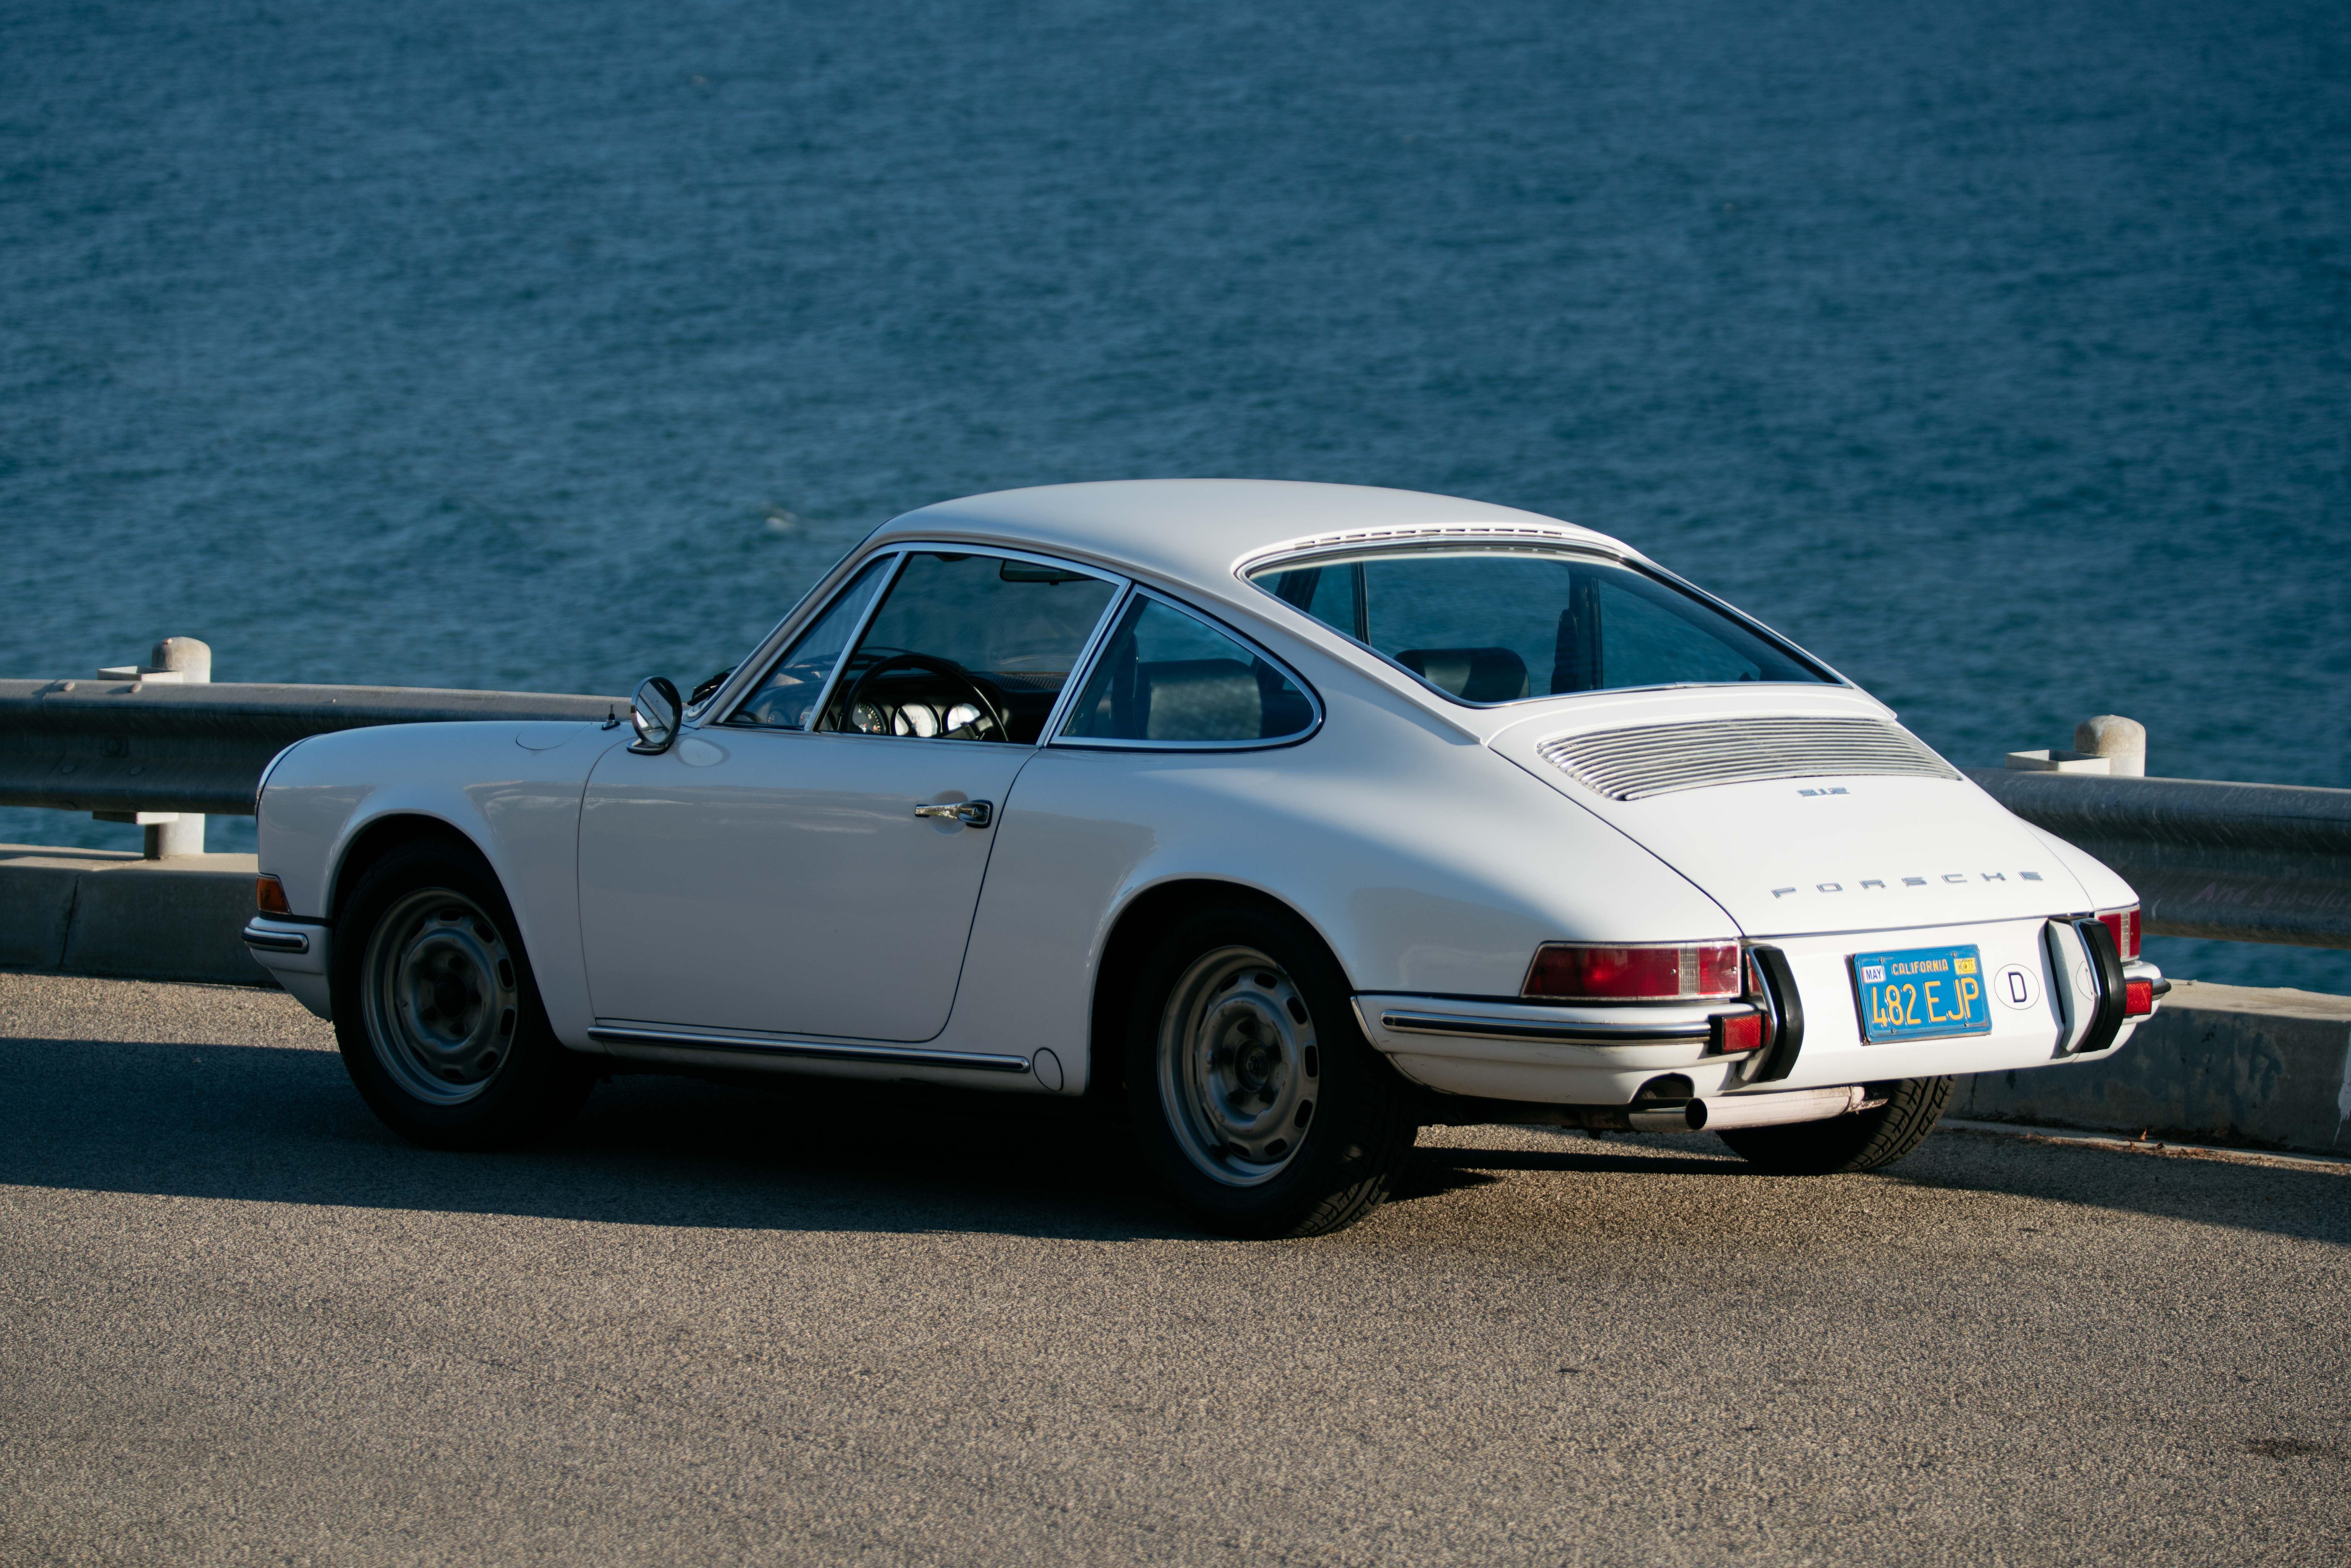 Why The Porsche 912 Has Its Own Cult Following | Gizmodo Australia